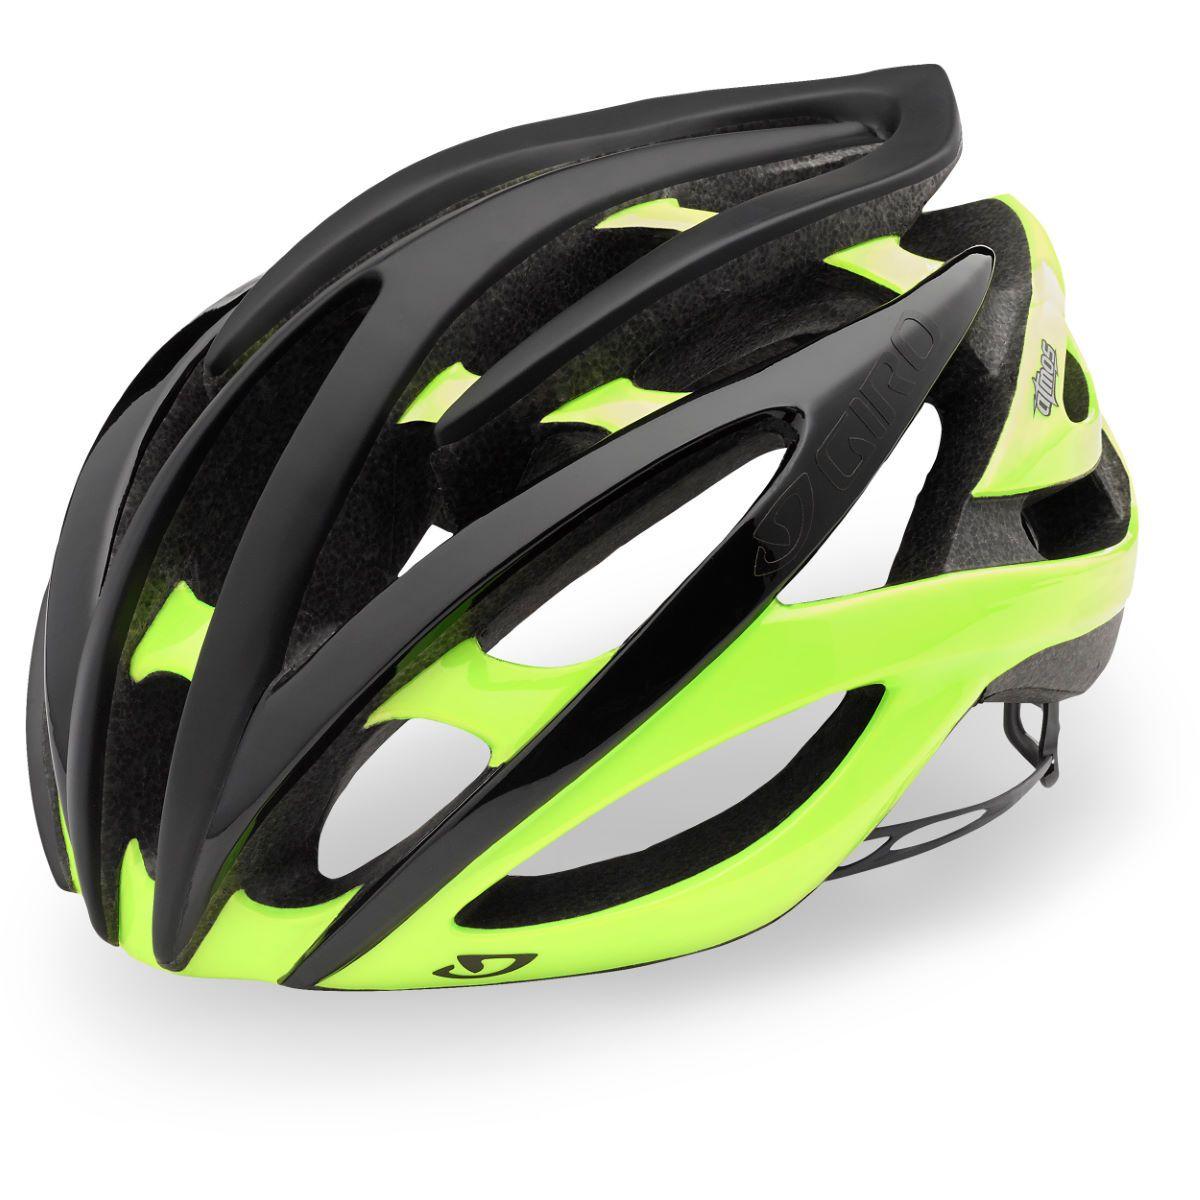 Giro Atmos 2 Road Helmet Road Helmets The Giro Atmos 2 Uses Their Thermoformed Sl Roll Cage Reinforcement Which Is Bike Helmet Mountain Bike Helmets Helmet